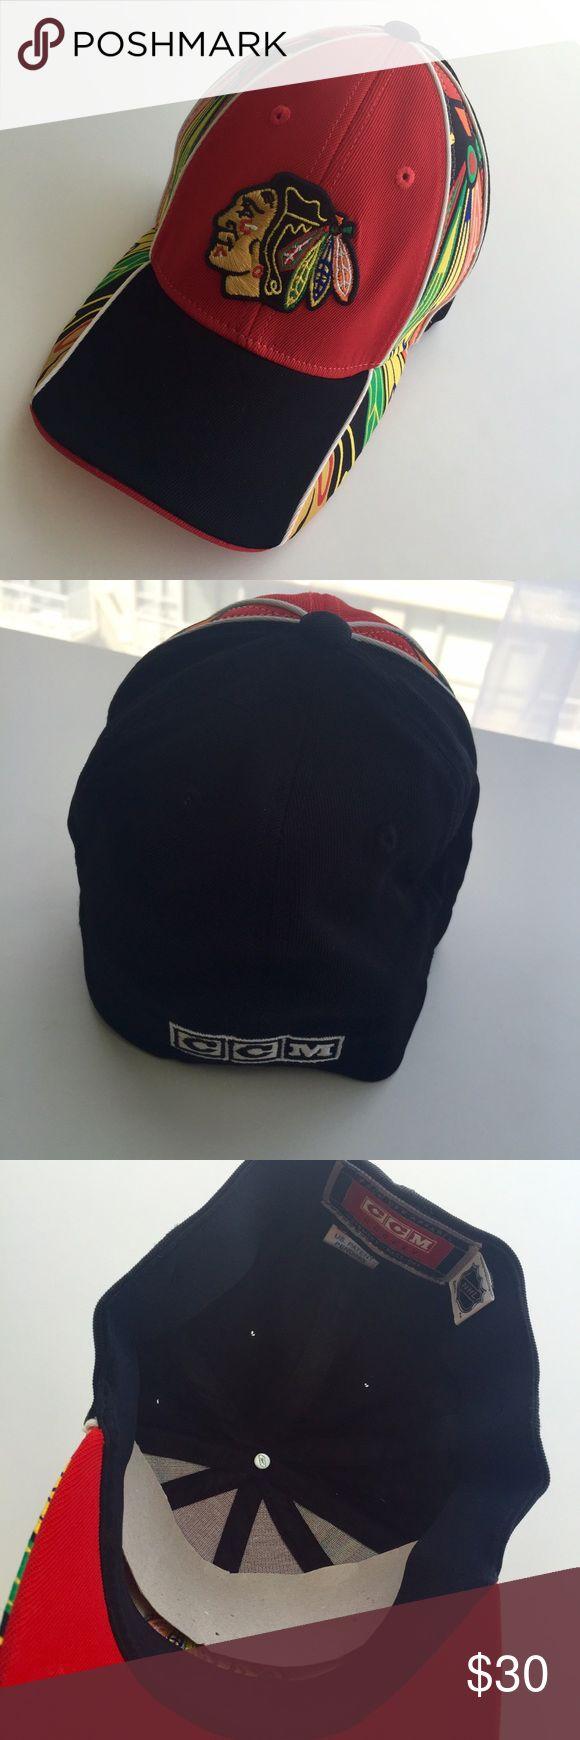 🔥 Chicago Blackhawks Hat NWOT NHL Chicago Blackhawks hockey hat. NWOT. perfect condition! Accessories Hats